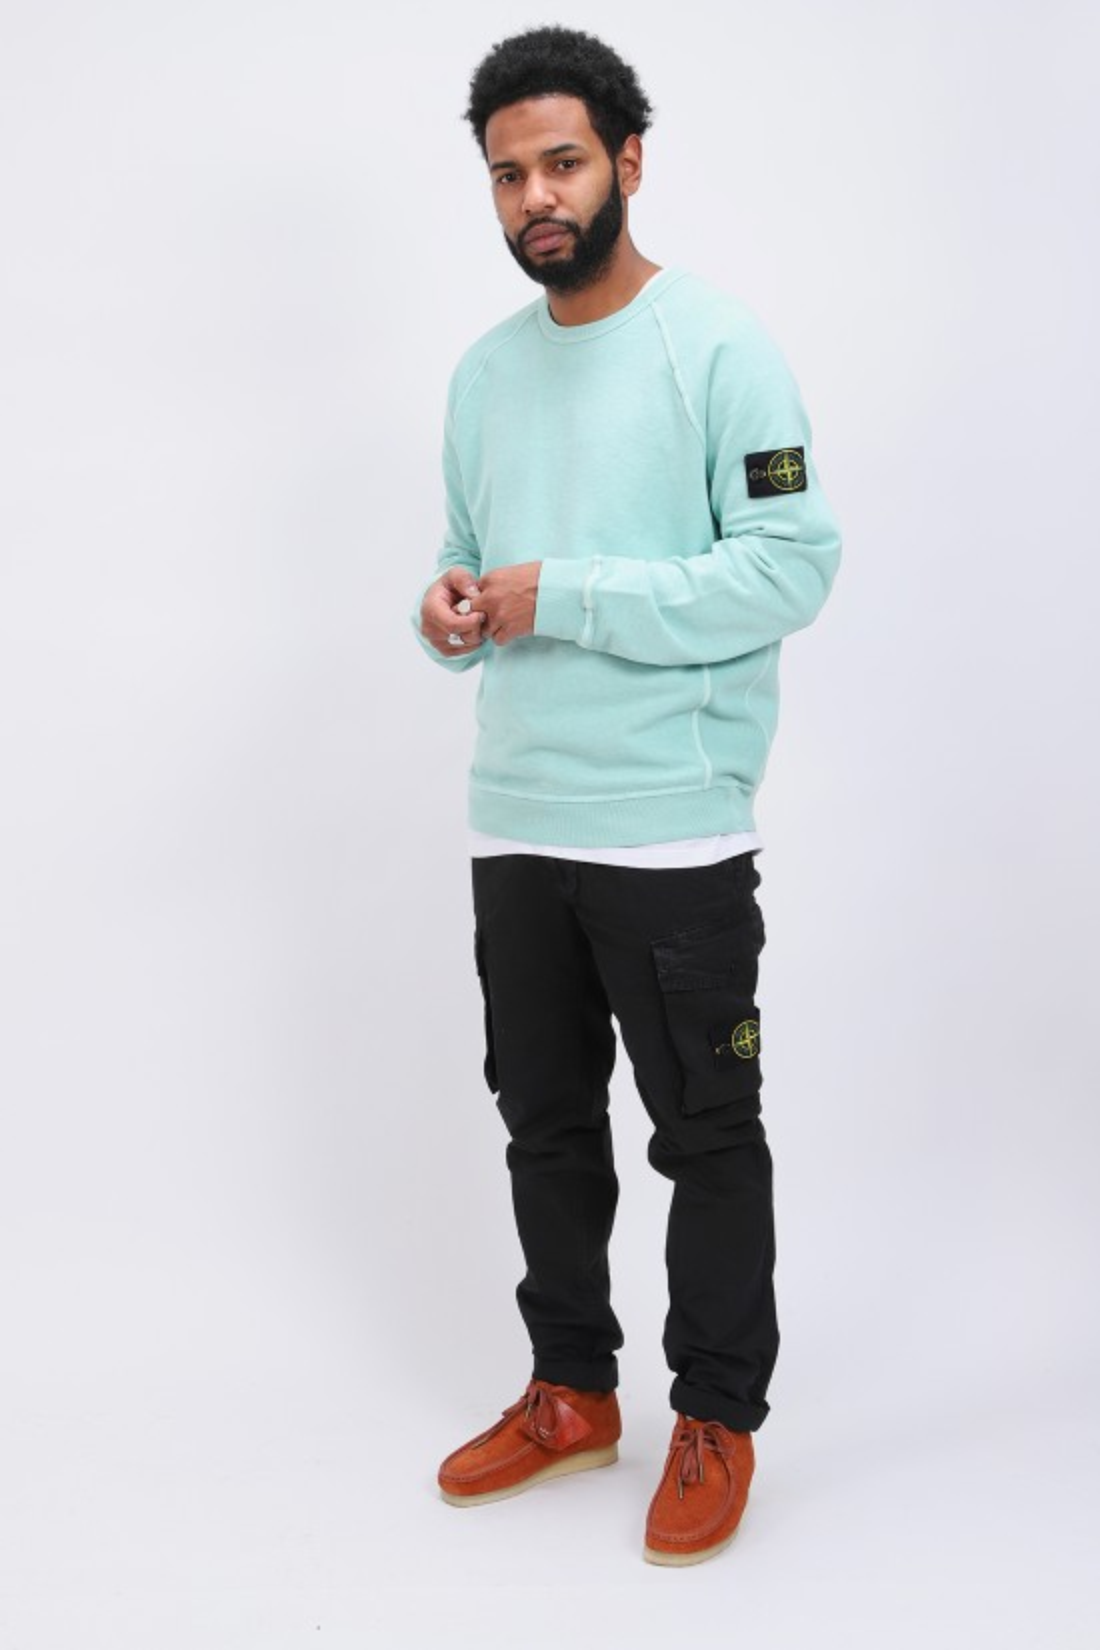 STONE ISLAND / 66060 raglan sweater v0144 Acqua